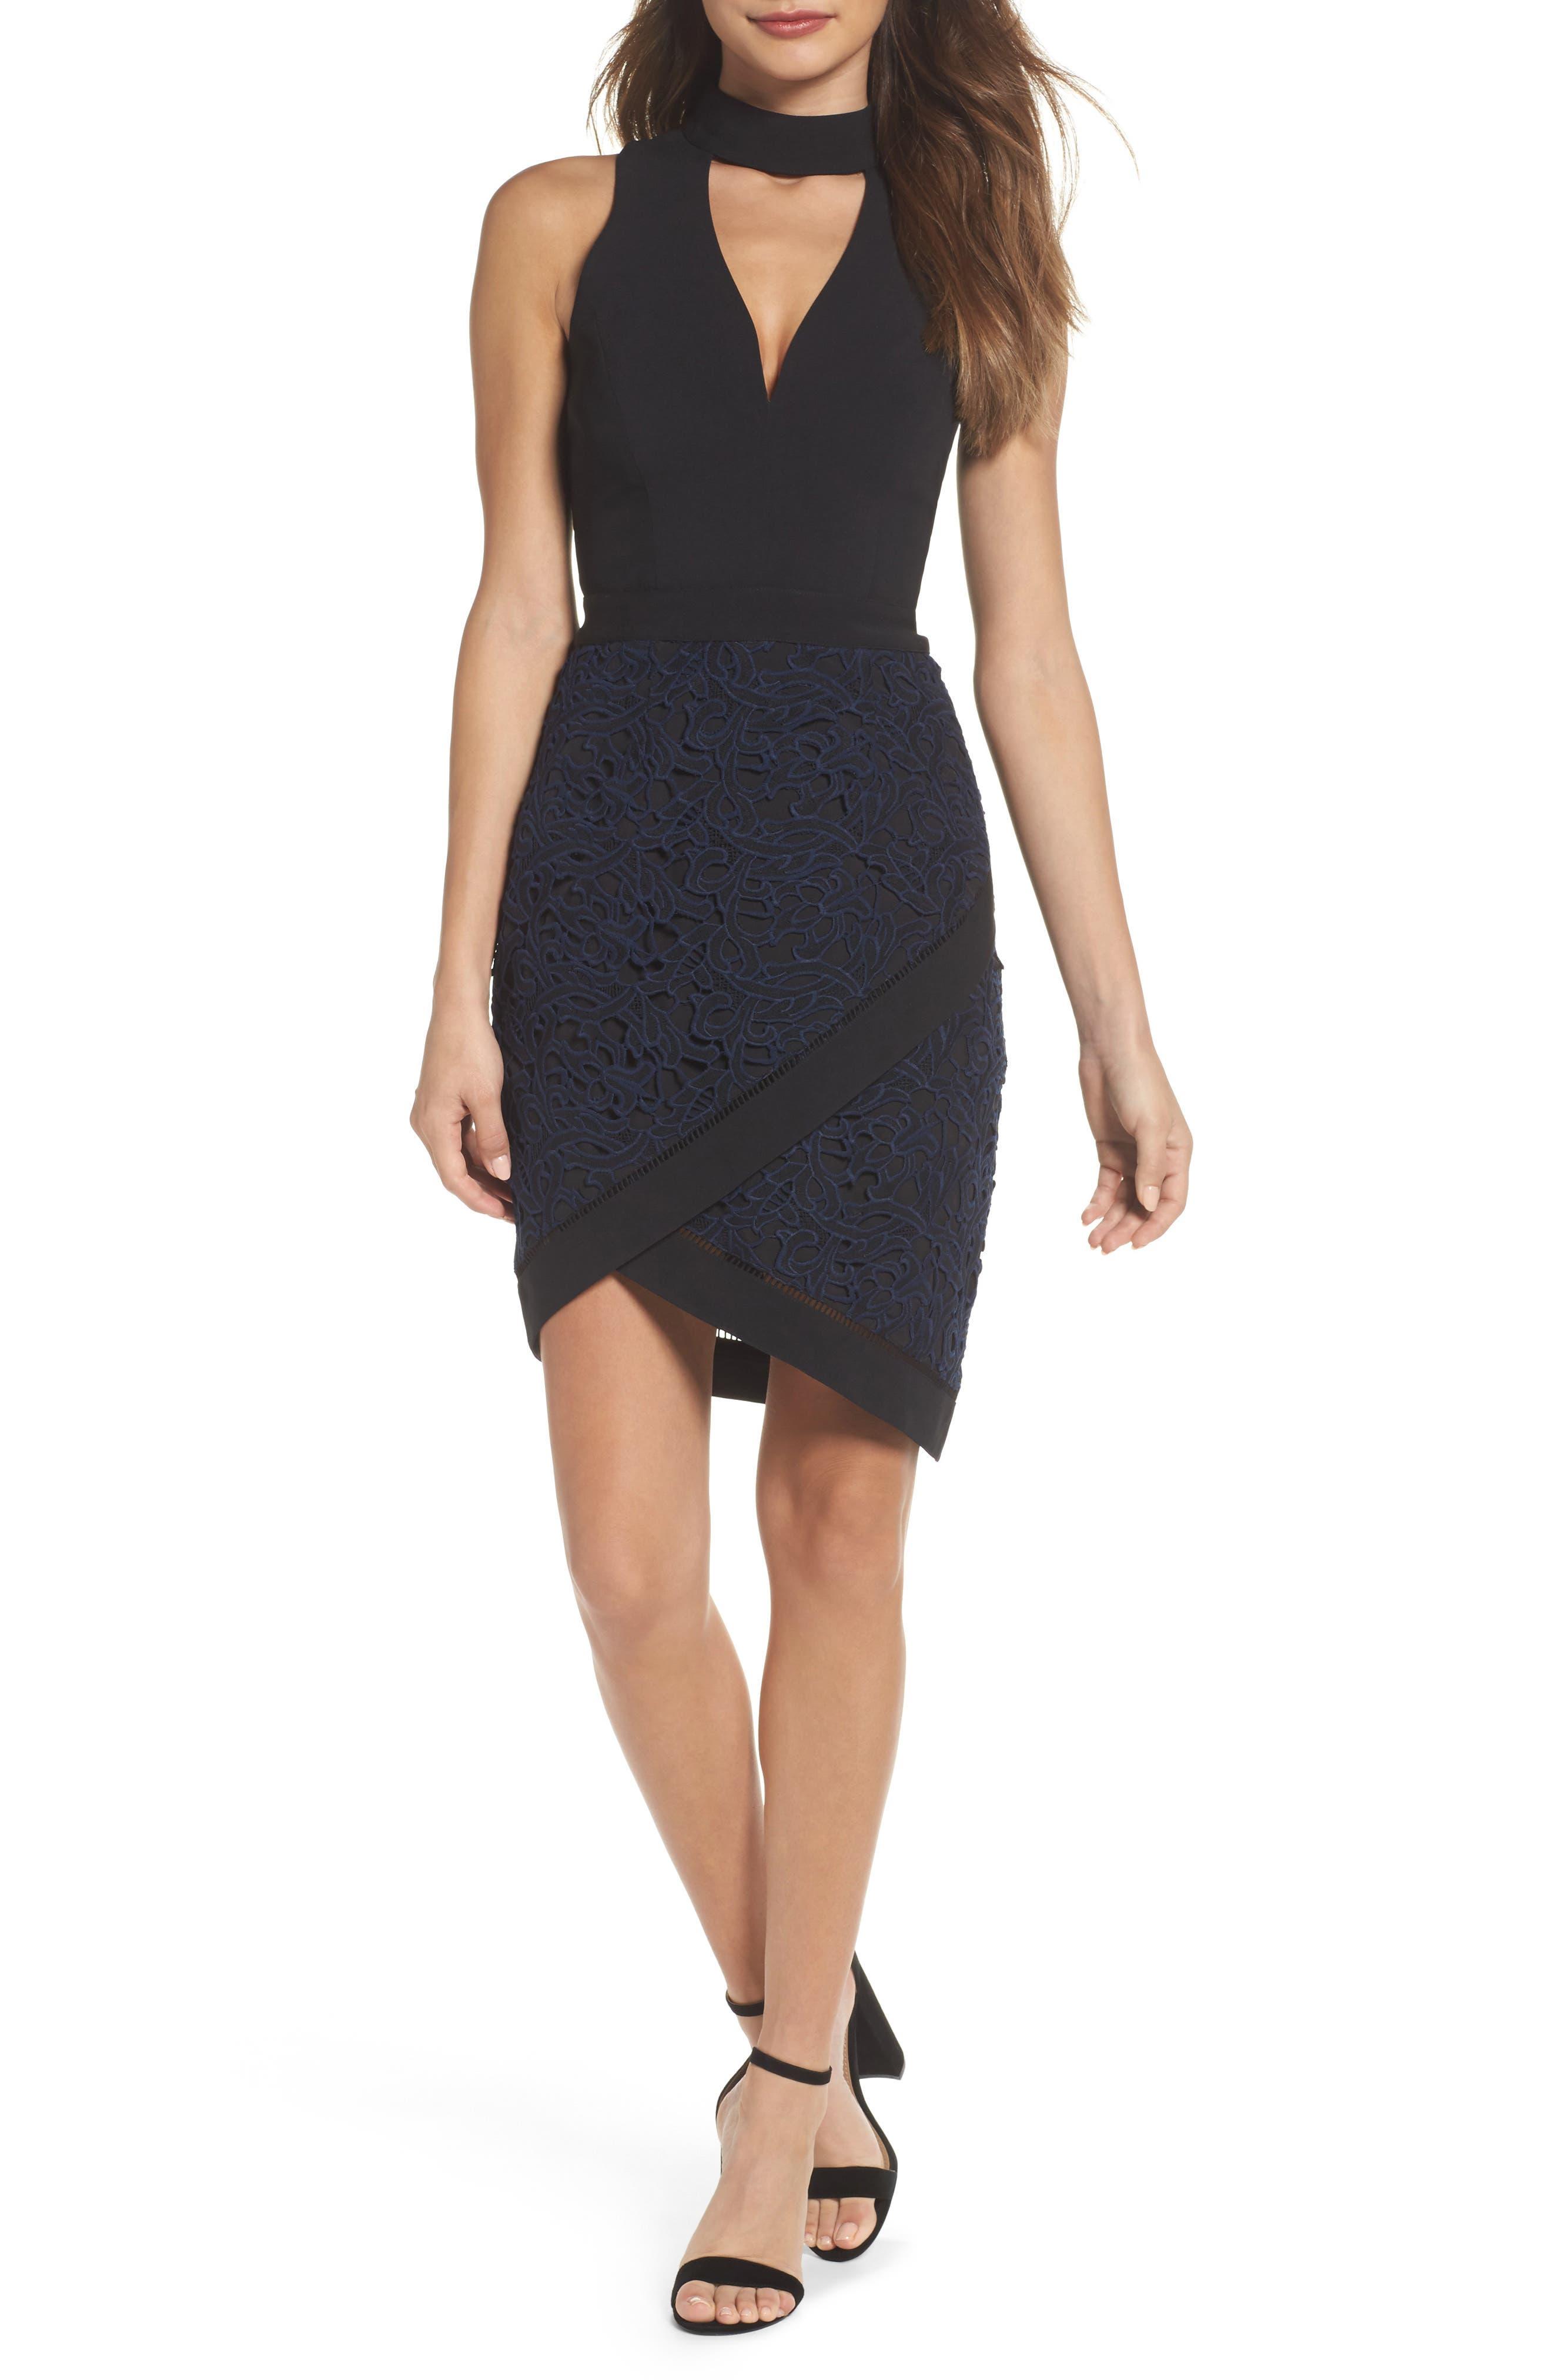 Alternate Image 1 Selected - Adelyn Rae Choker Sheath Dress